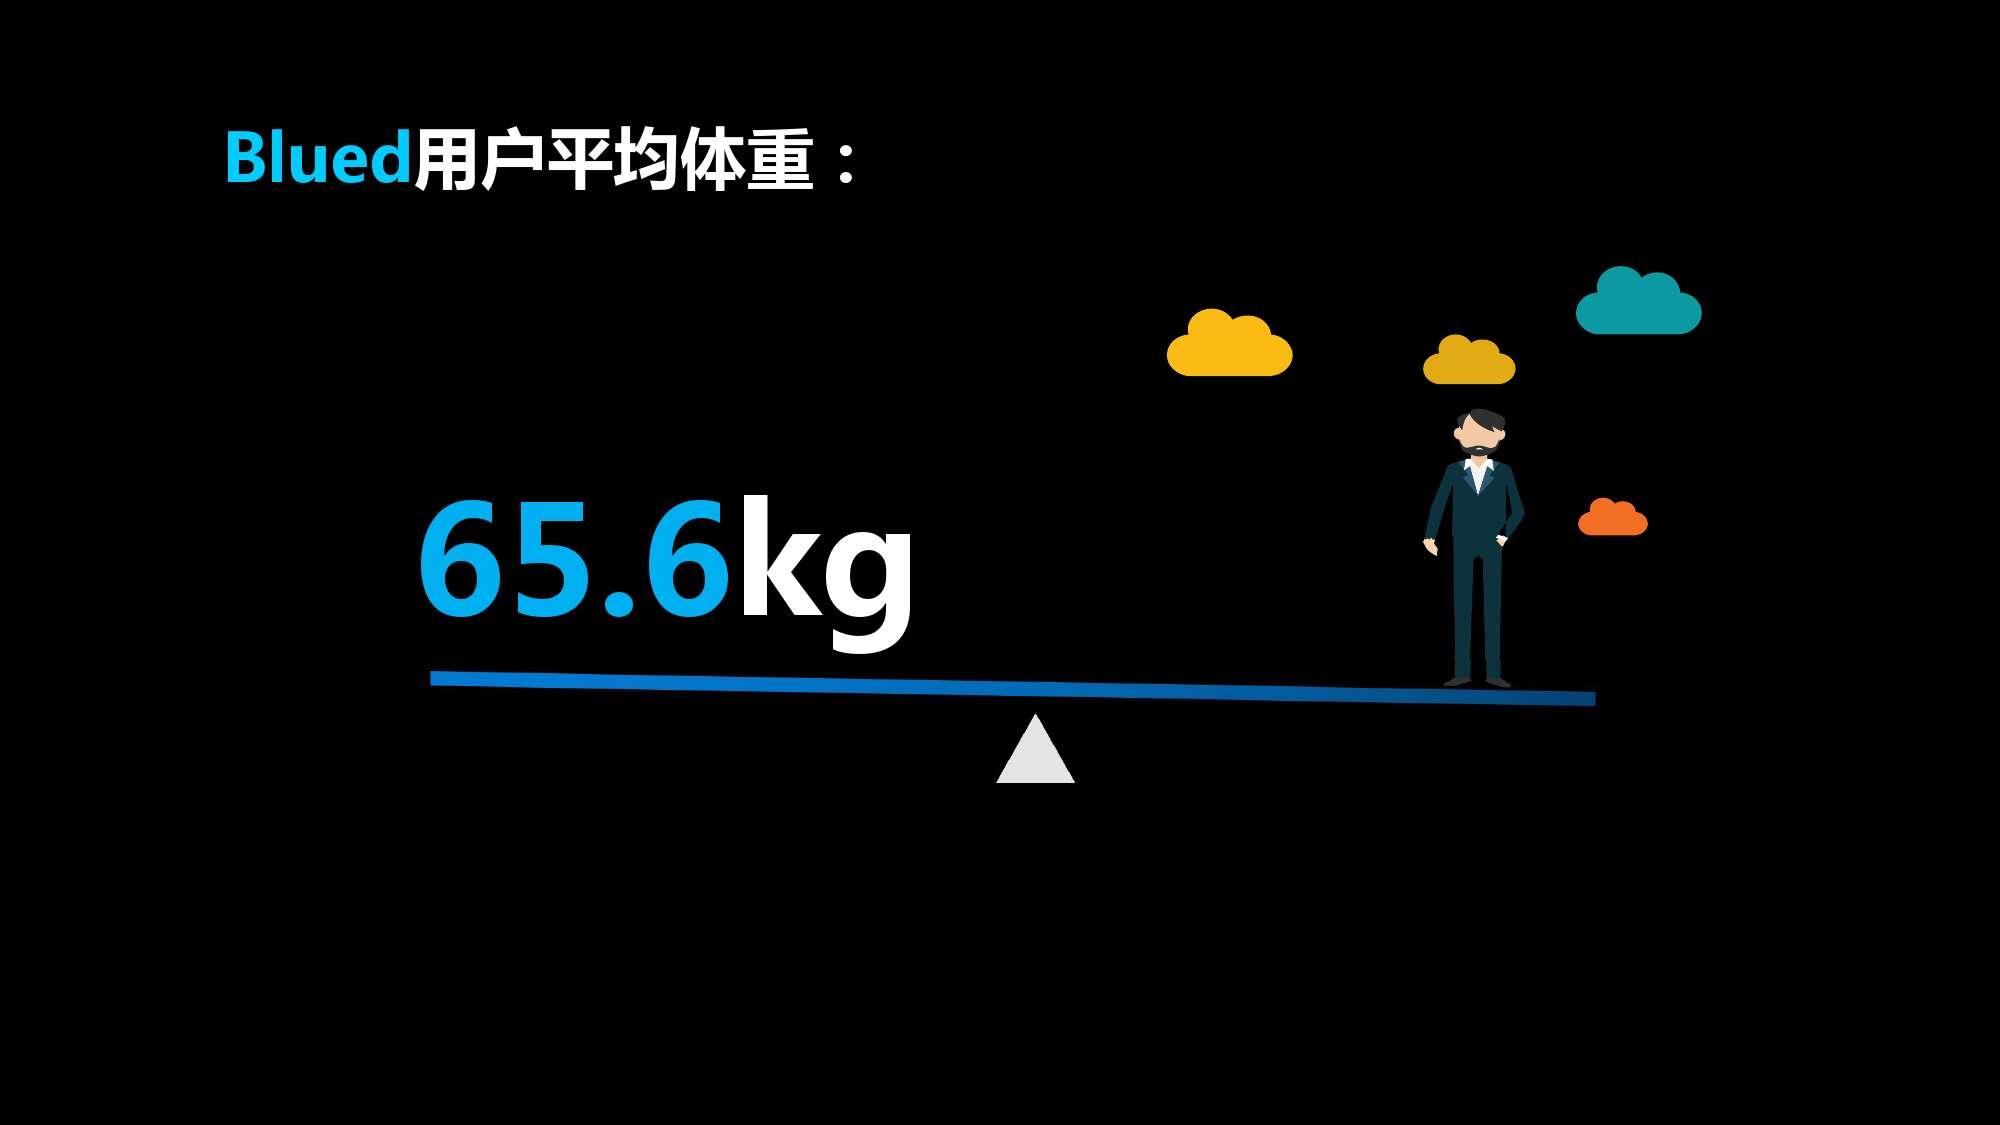 Blued2015中国同志社群大数据白皮书_000011